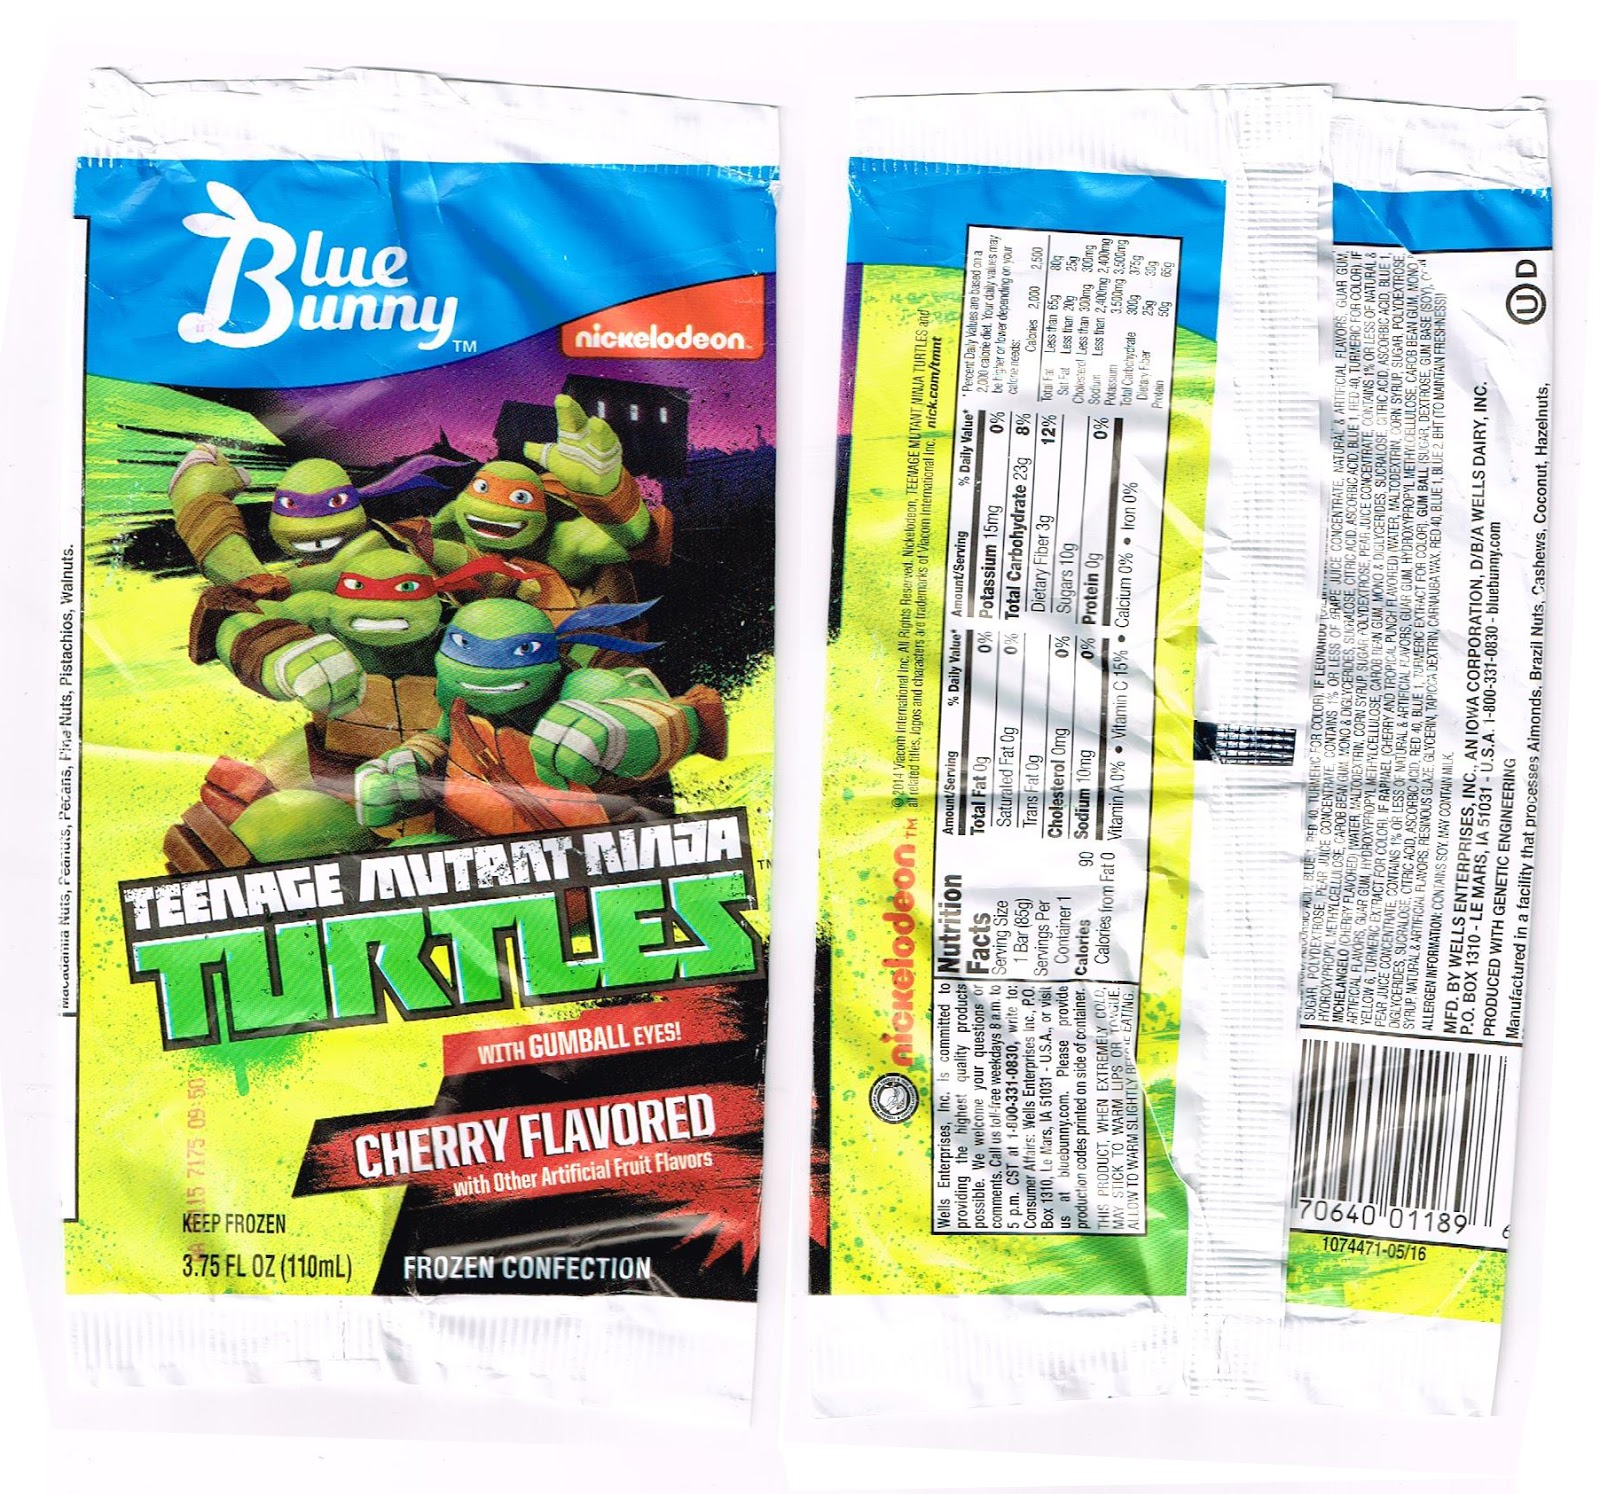 20 Years Before 2000 Ninja Turtle Ice Pops